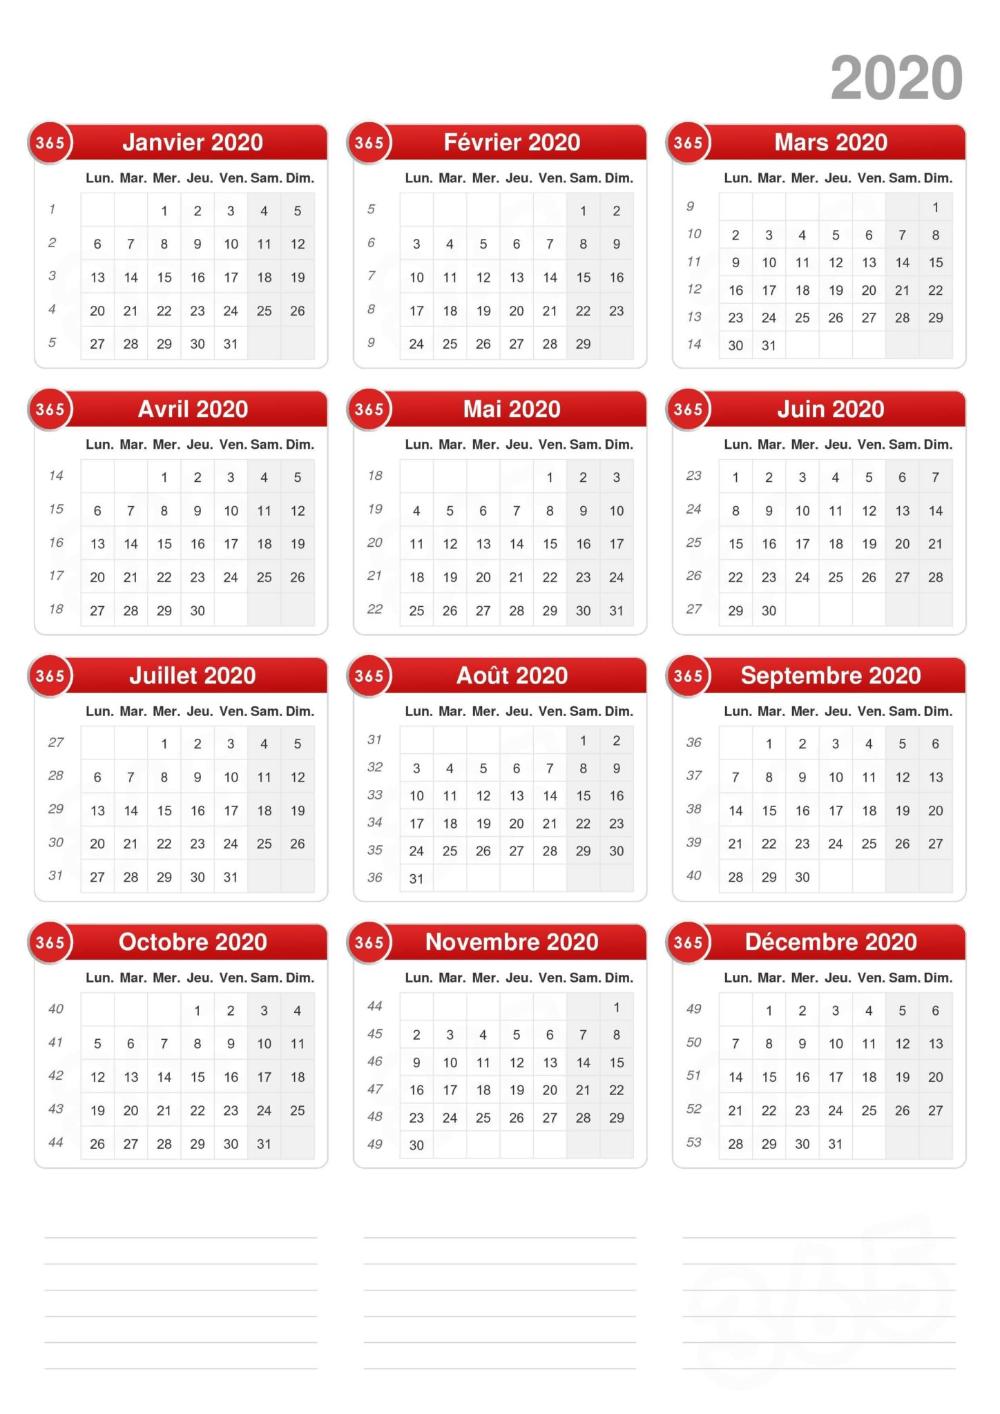 Annuel 2020 Calendrier Exceller Images Nosuvia Com In 2020 Calendar Printables Calendar Template Print Calendar